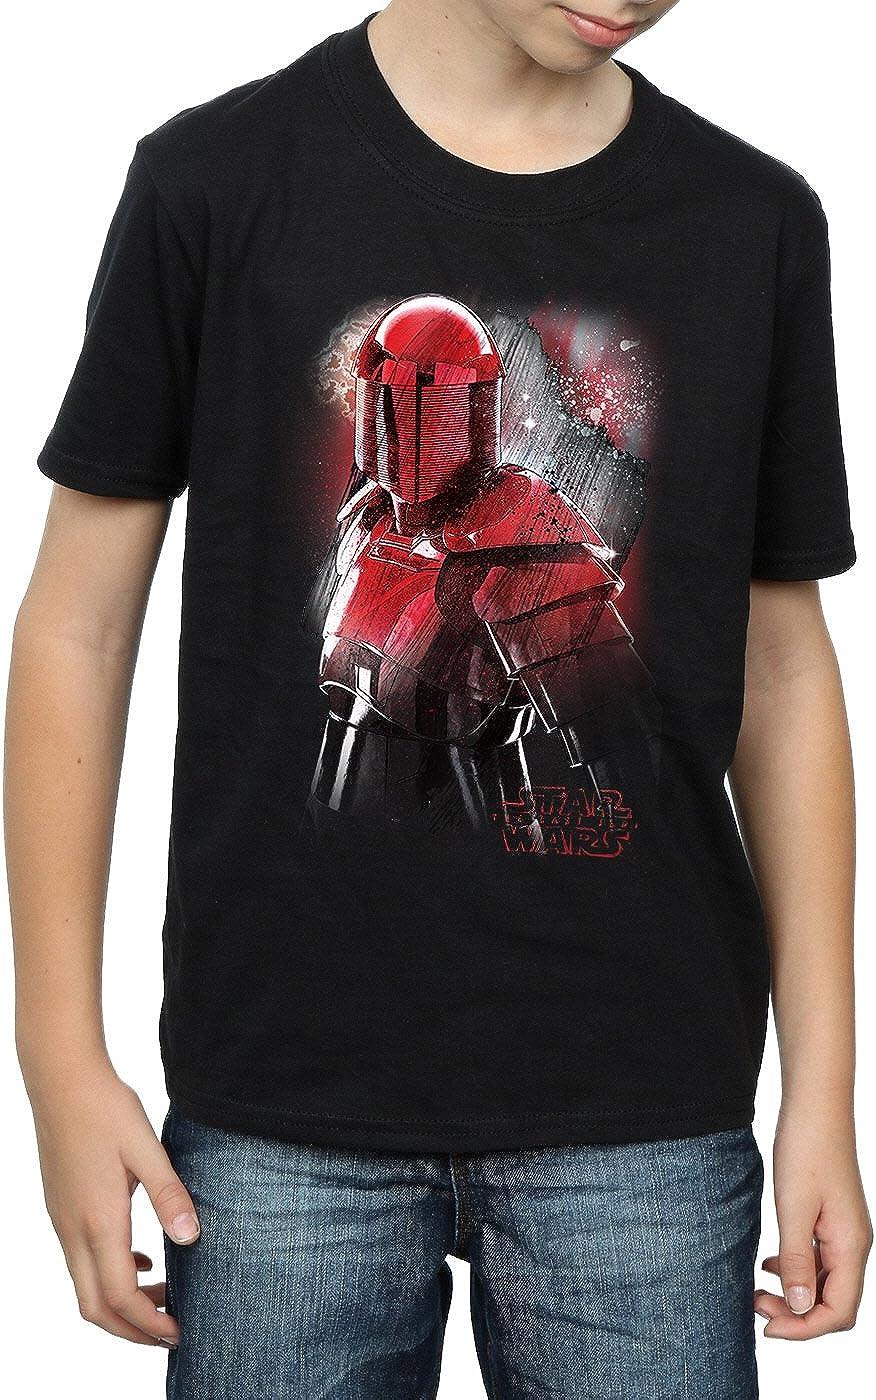 STAR WARS Boys The Last Jedi Praetorian Guard Brushed T-Shirt 7-8 Years Black